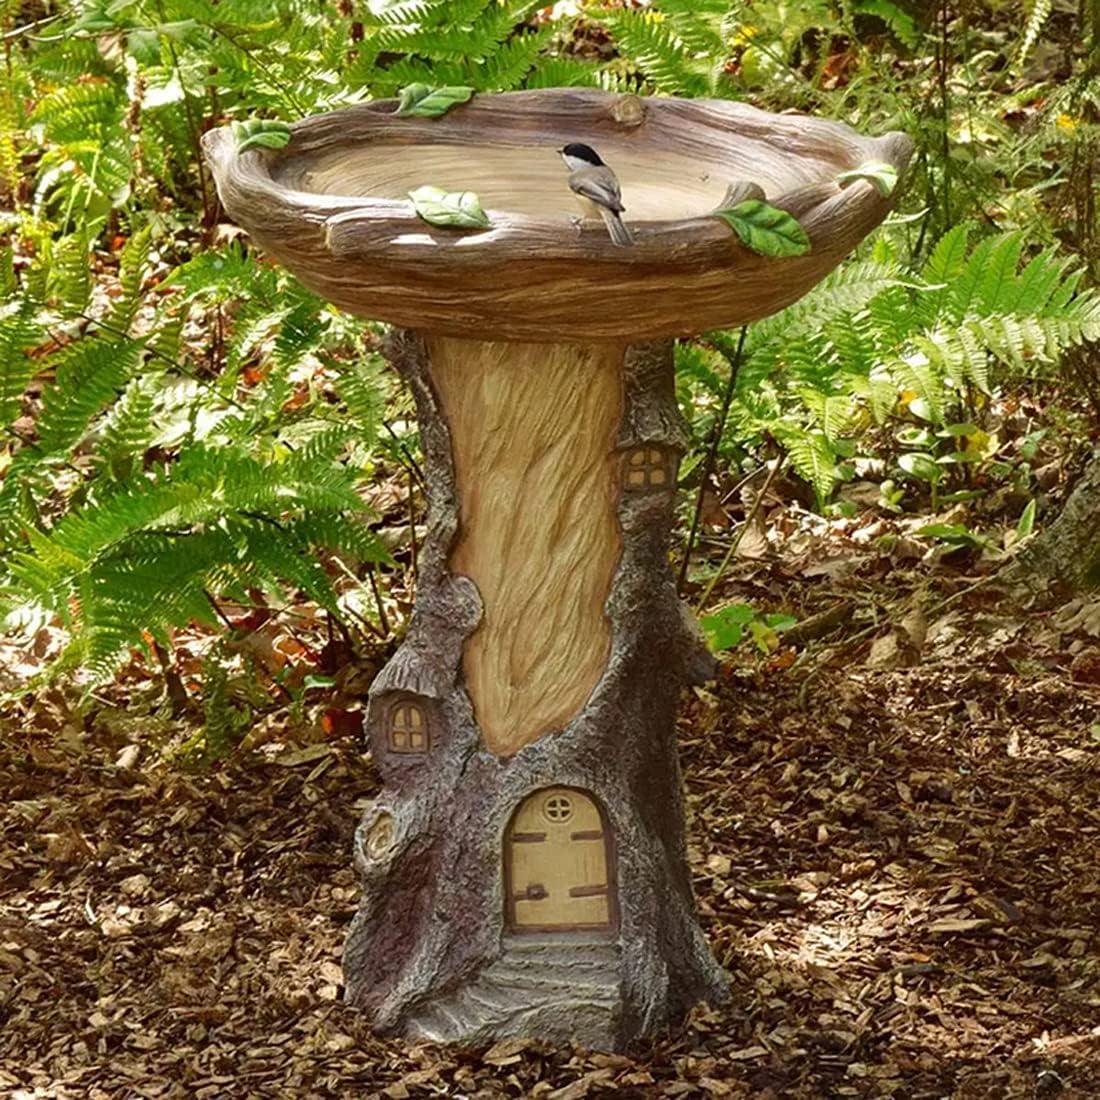 Max 79% OFF Creative Fairies Handmade Brown Pedestal for Bath Bird - Manufacturer direct delivery Outdoor